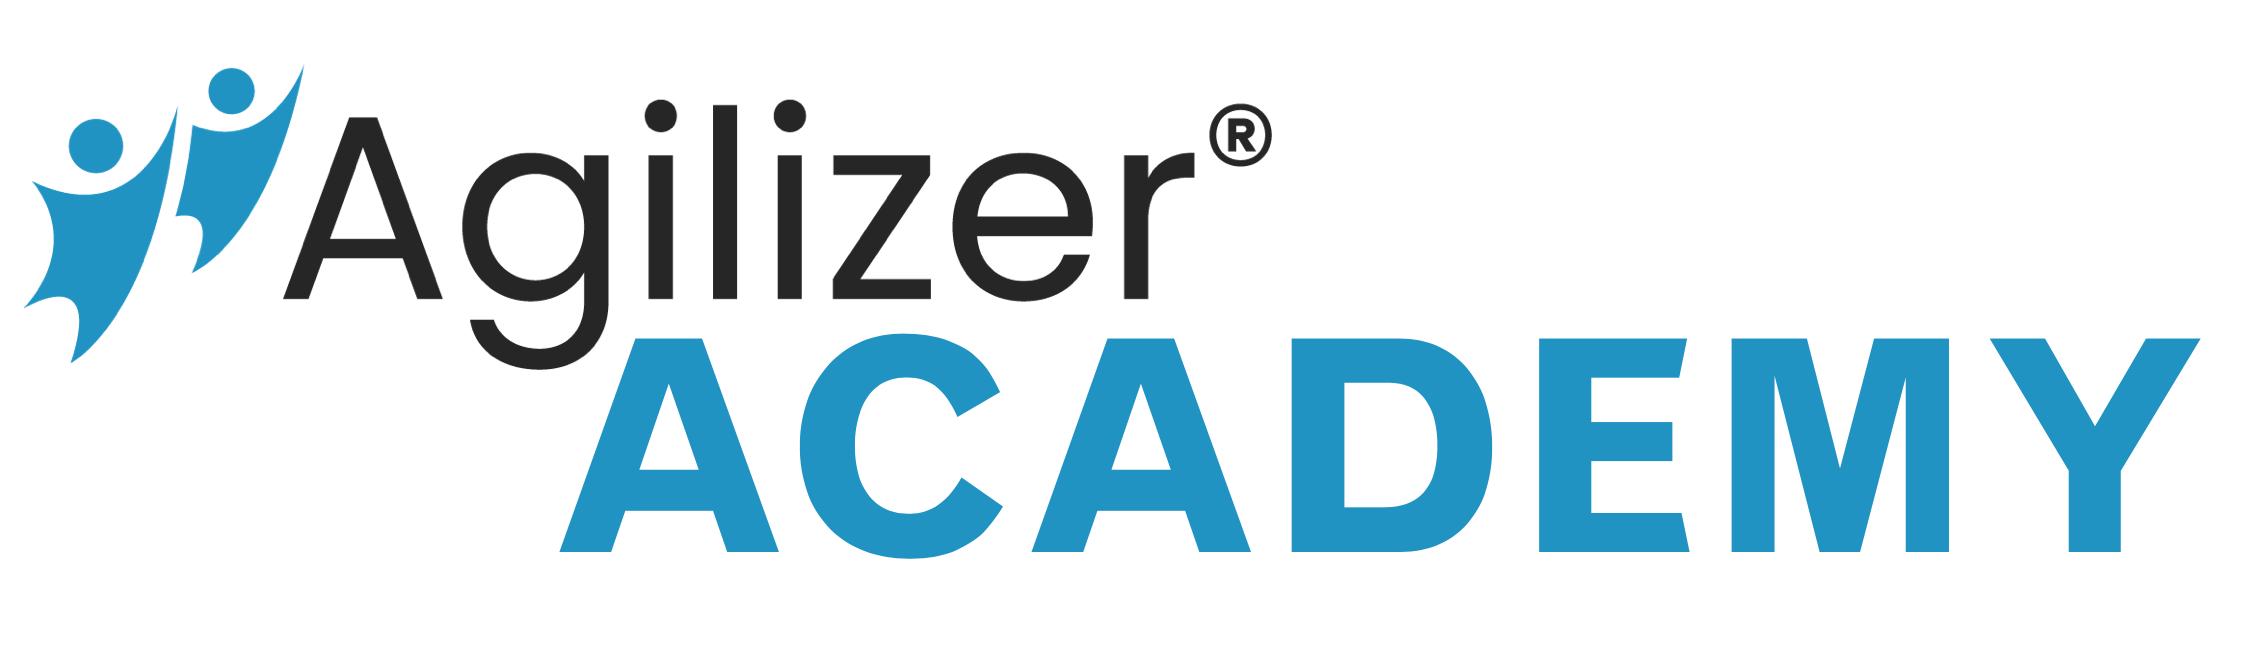 Agilizer Academy